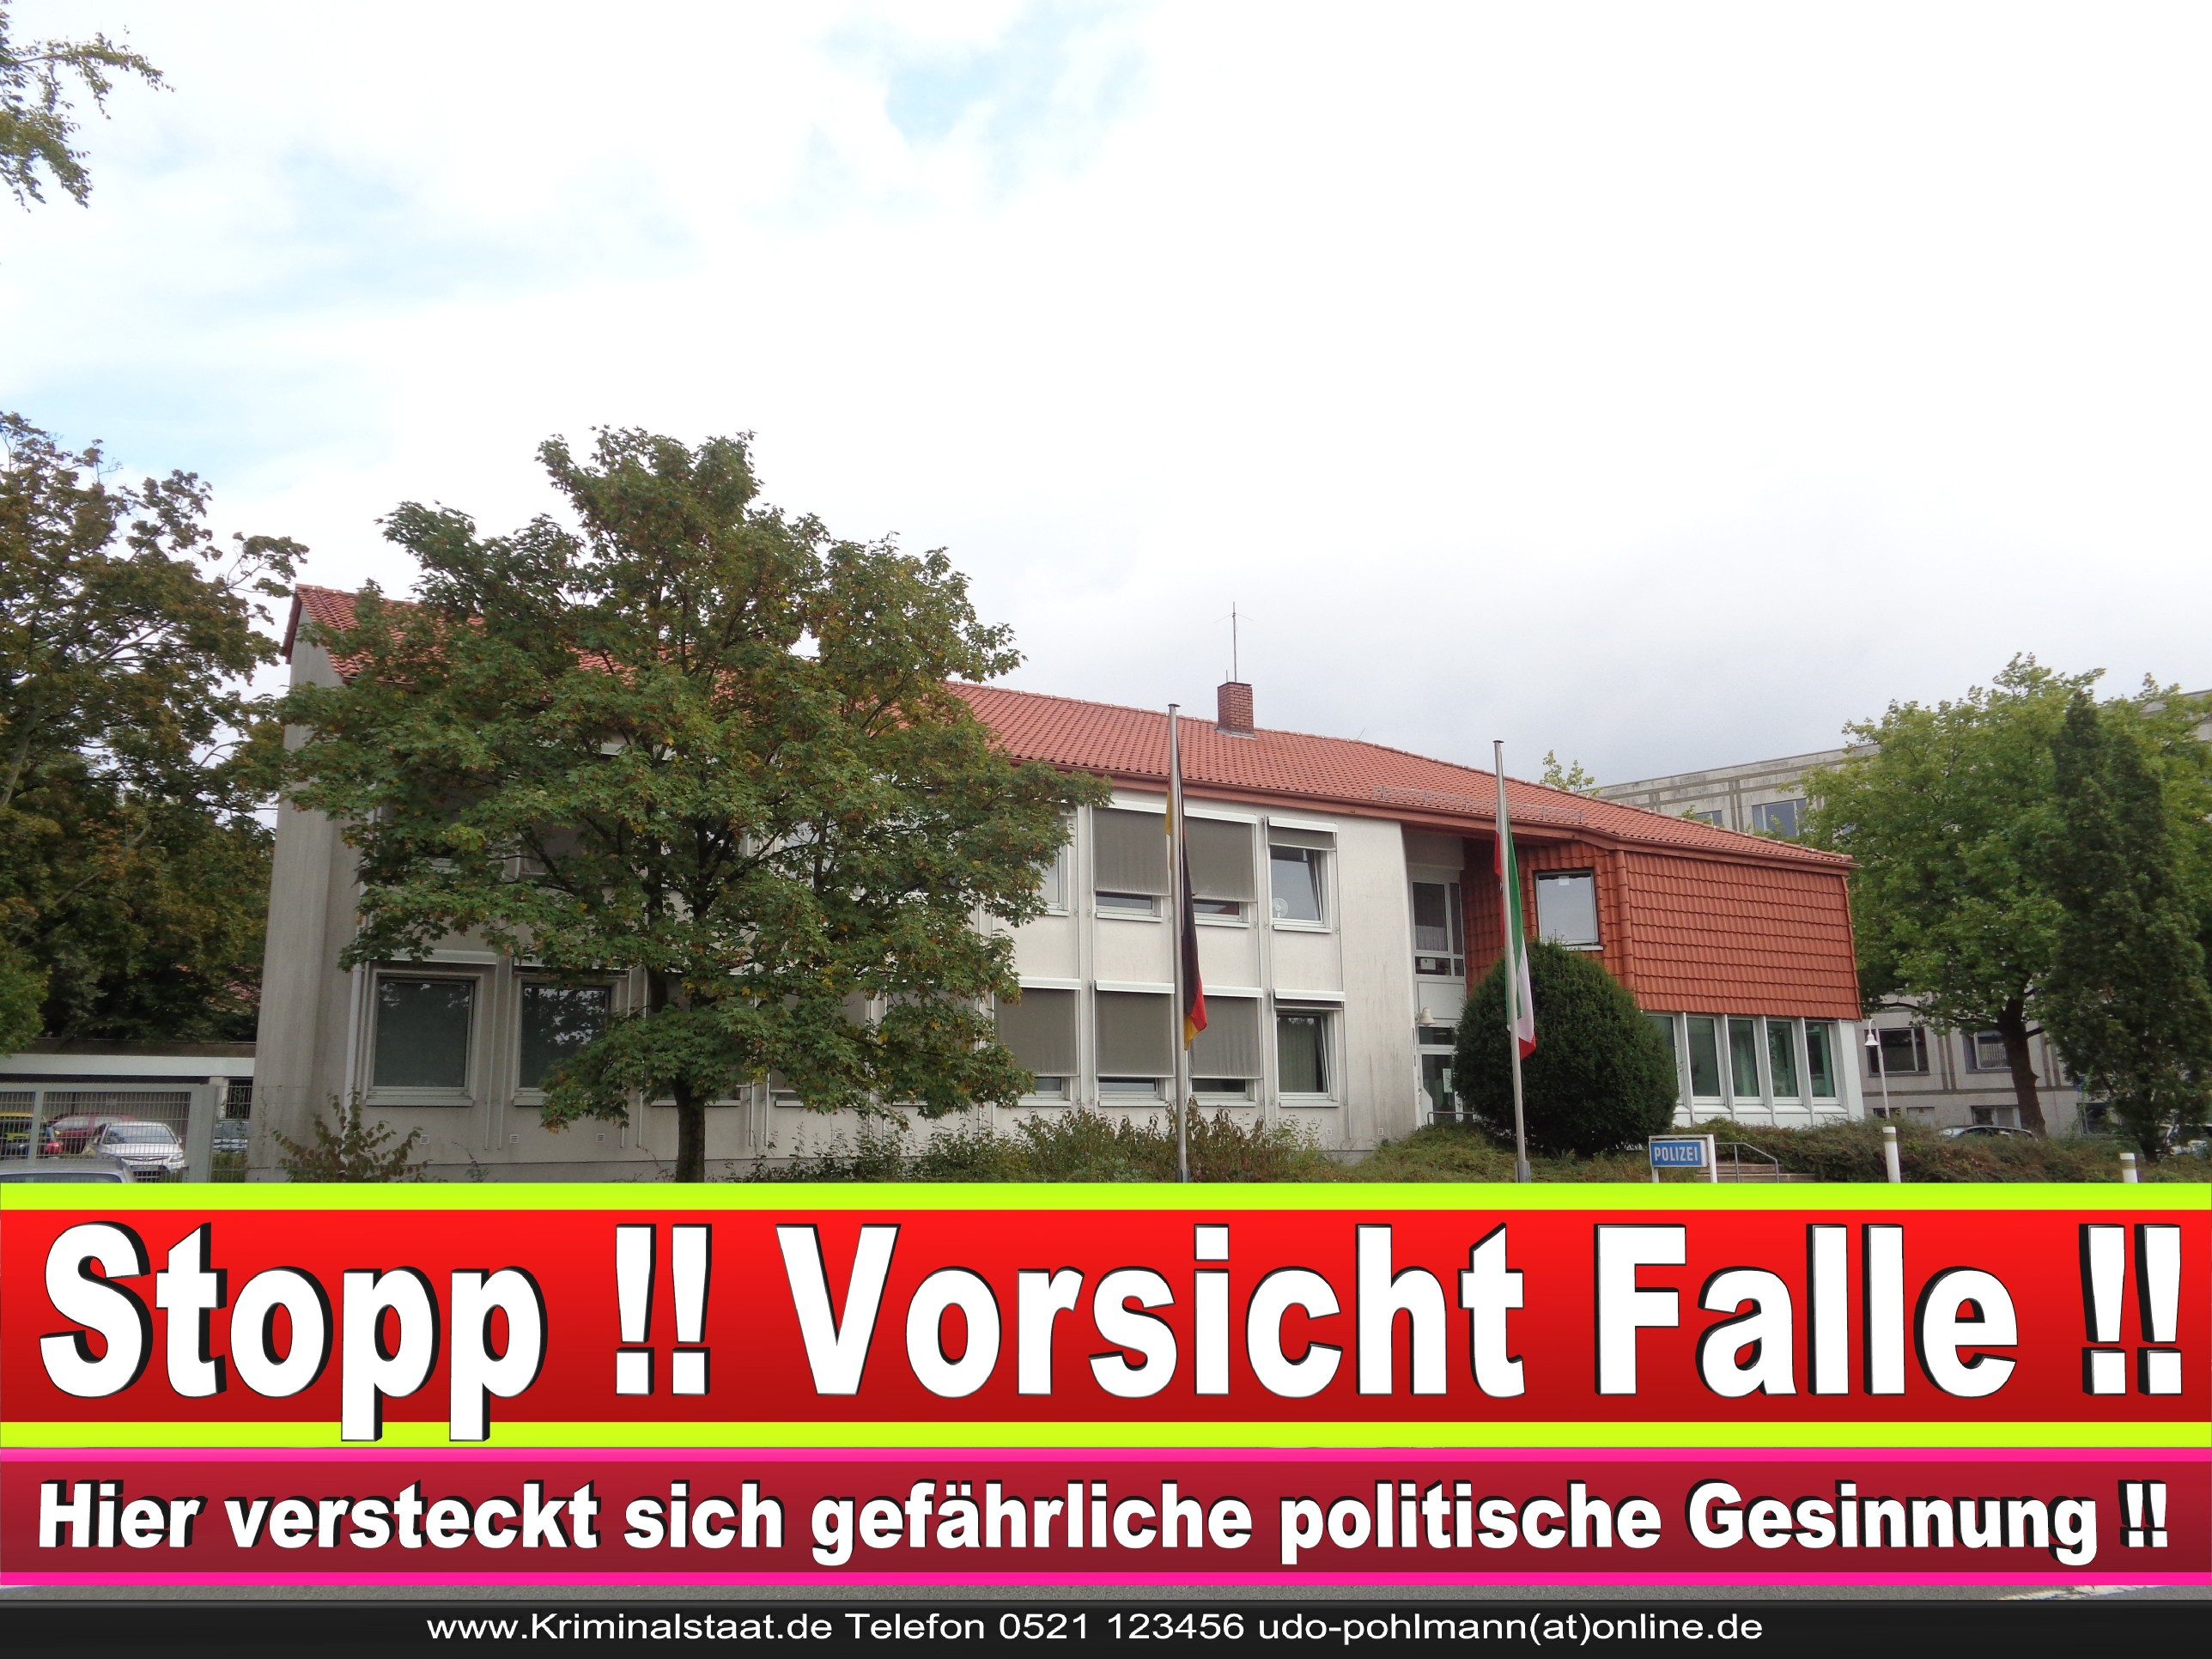 Polizei Brackwede Bielefeld Süd Ost Mitte Korruption In Bielefeld (1)